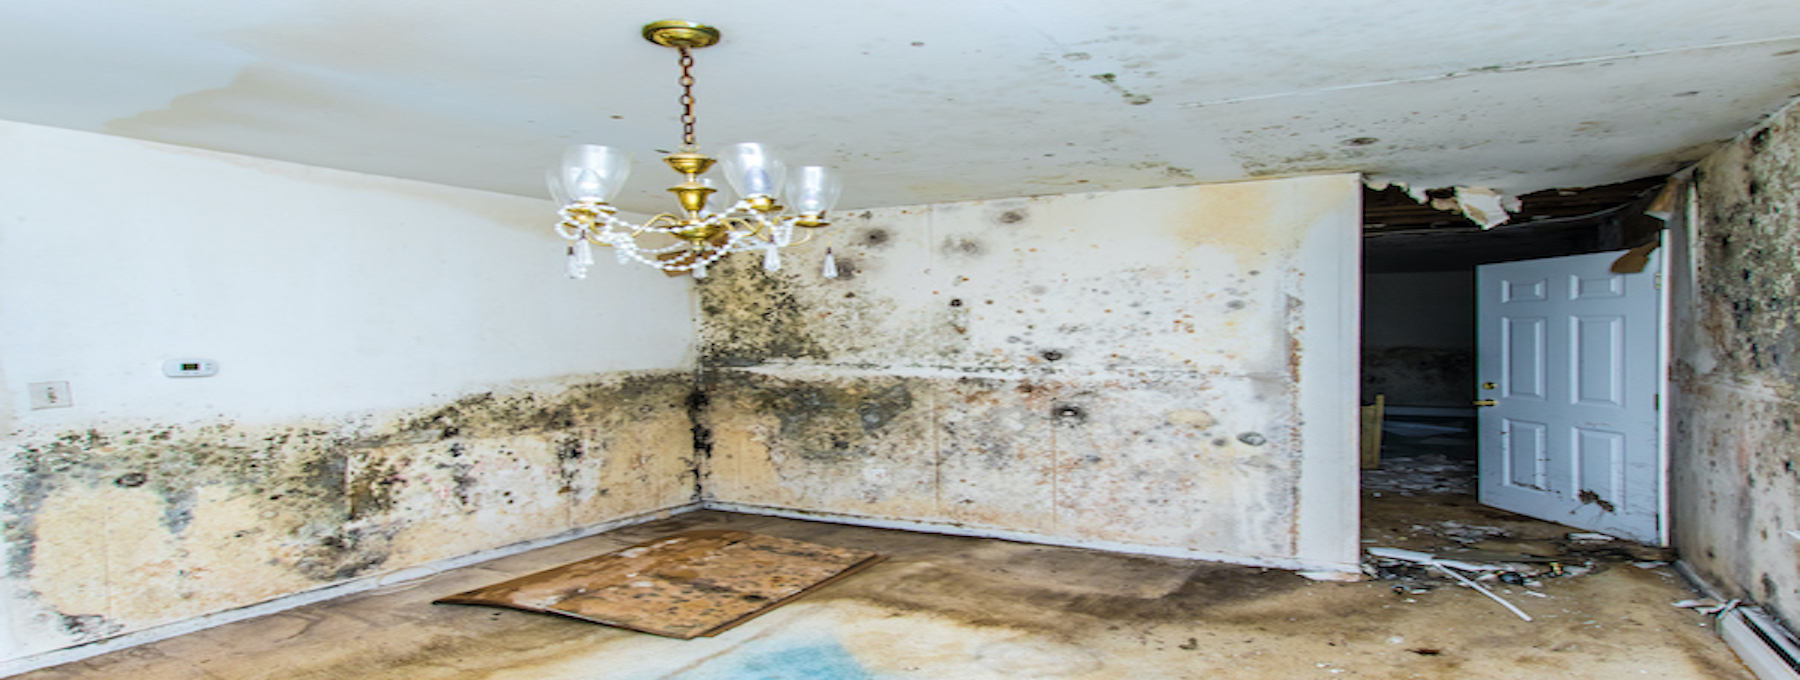 feltonville nc restoration services, feltonville nc restoration company